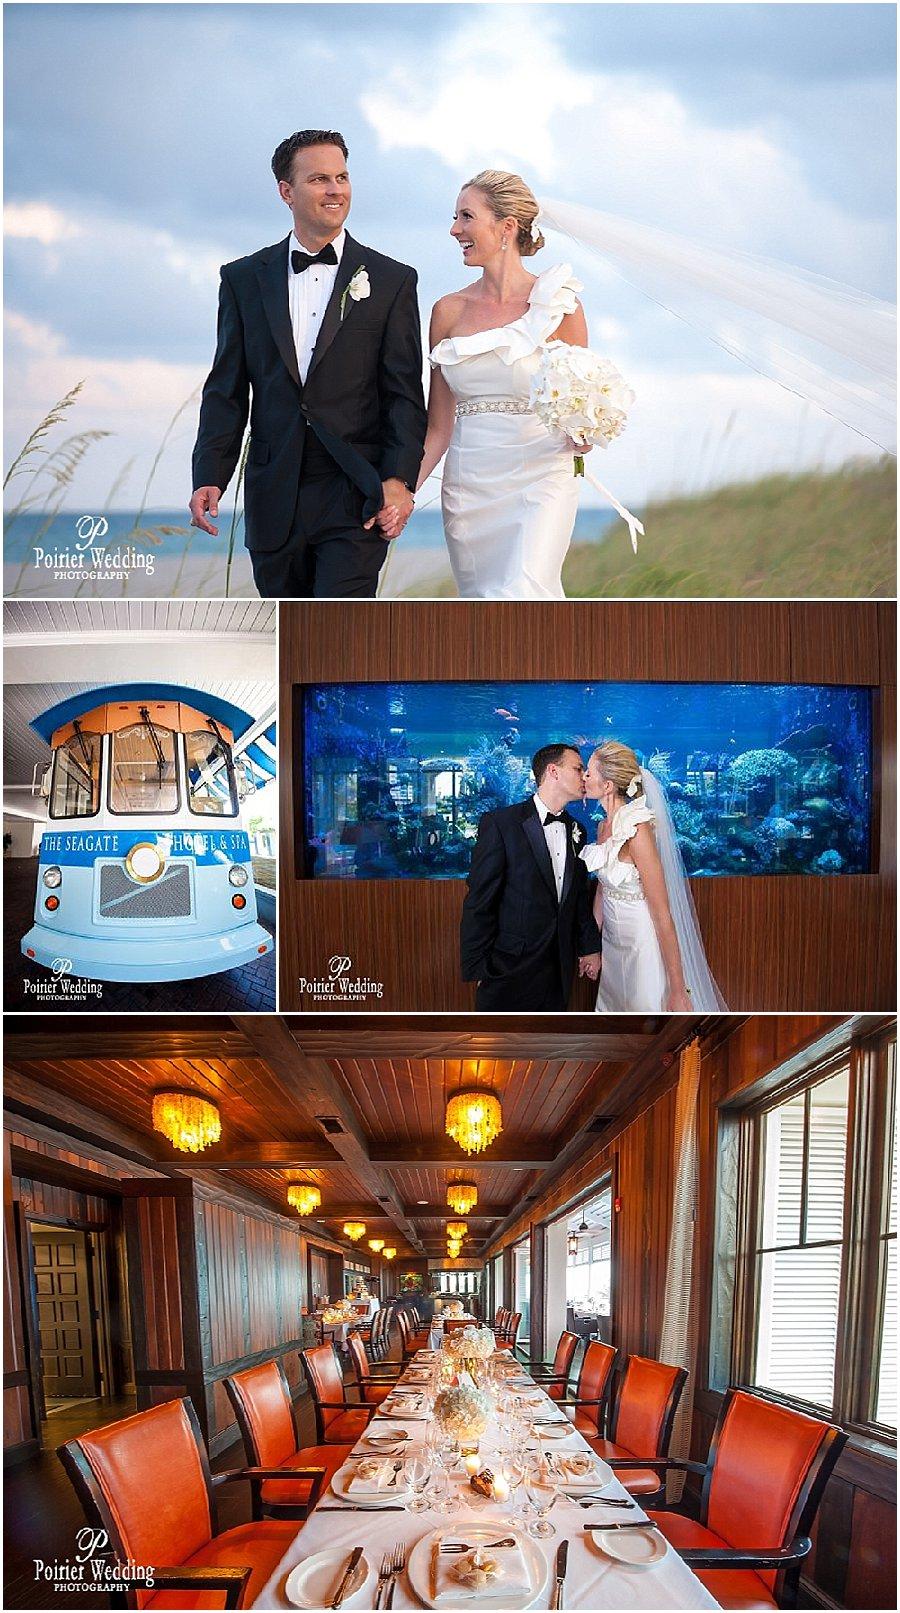 Beach Wedding Venue_Poirier Wedding Photography